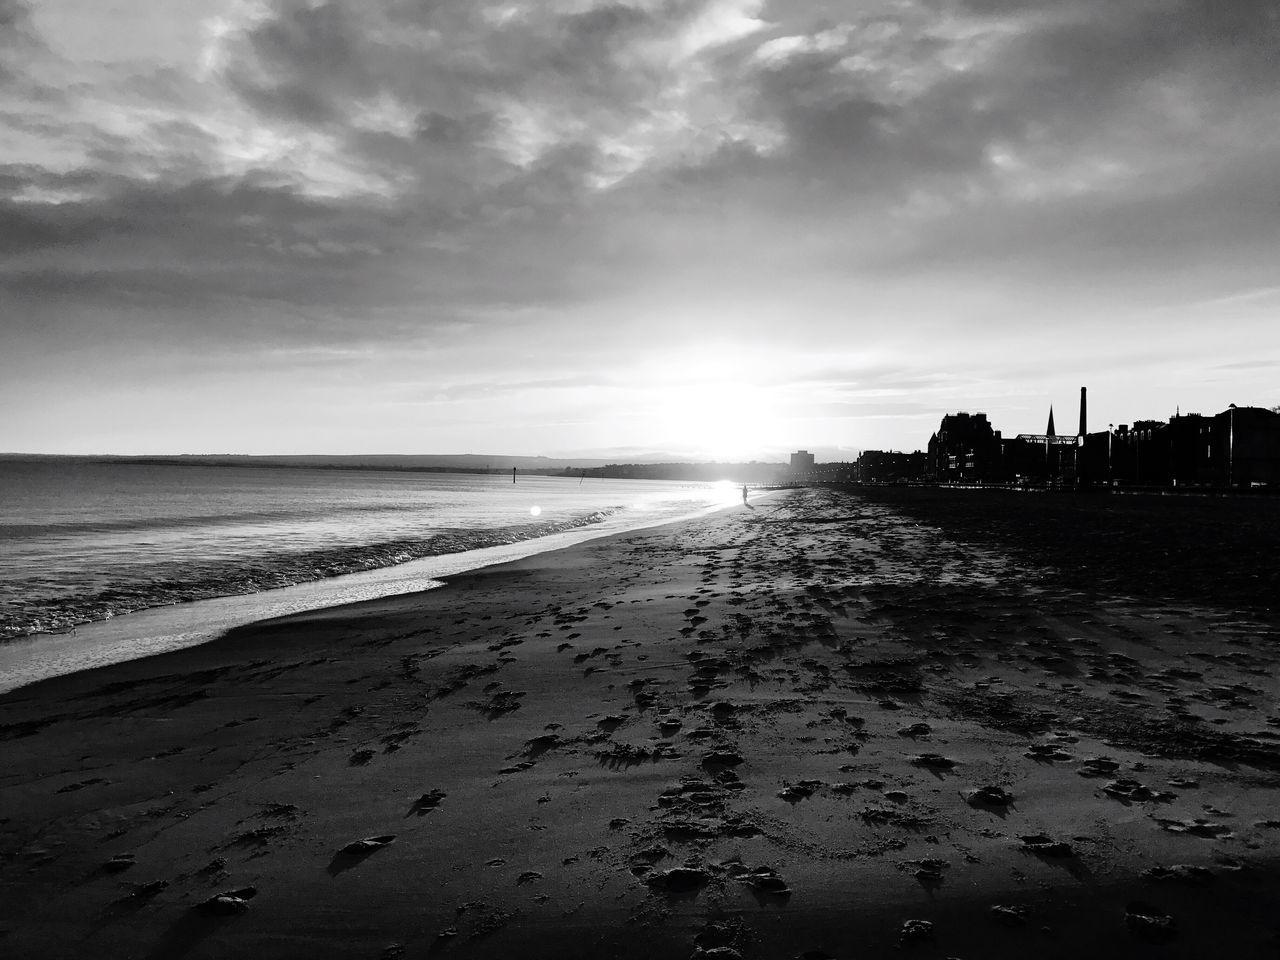 Sunset #sun #clouds #skylovers #sky #nature #beautifulinnature #naturalbeauty #photography #landscape Portobello Beach, Edinburgh Beauty In Nature EyeEm Best Shots